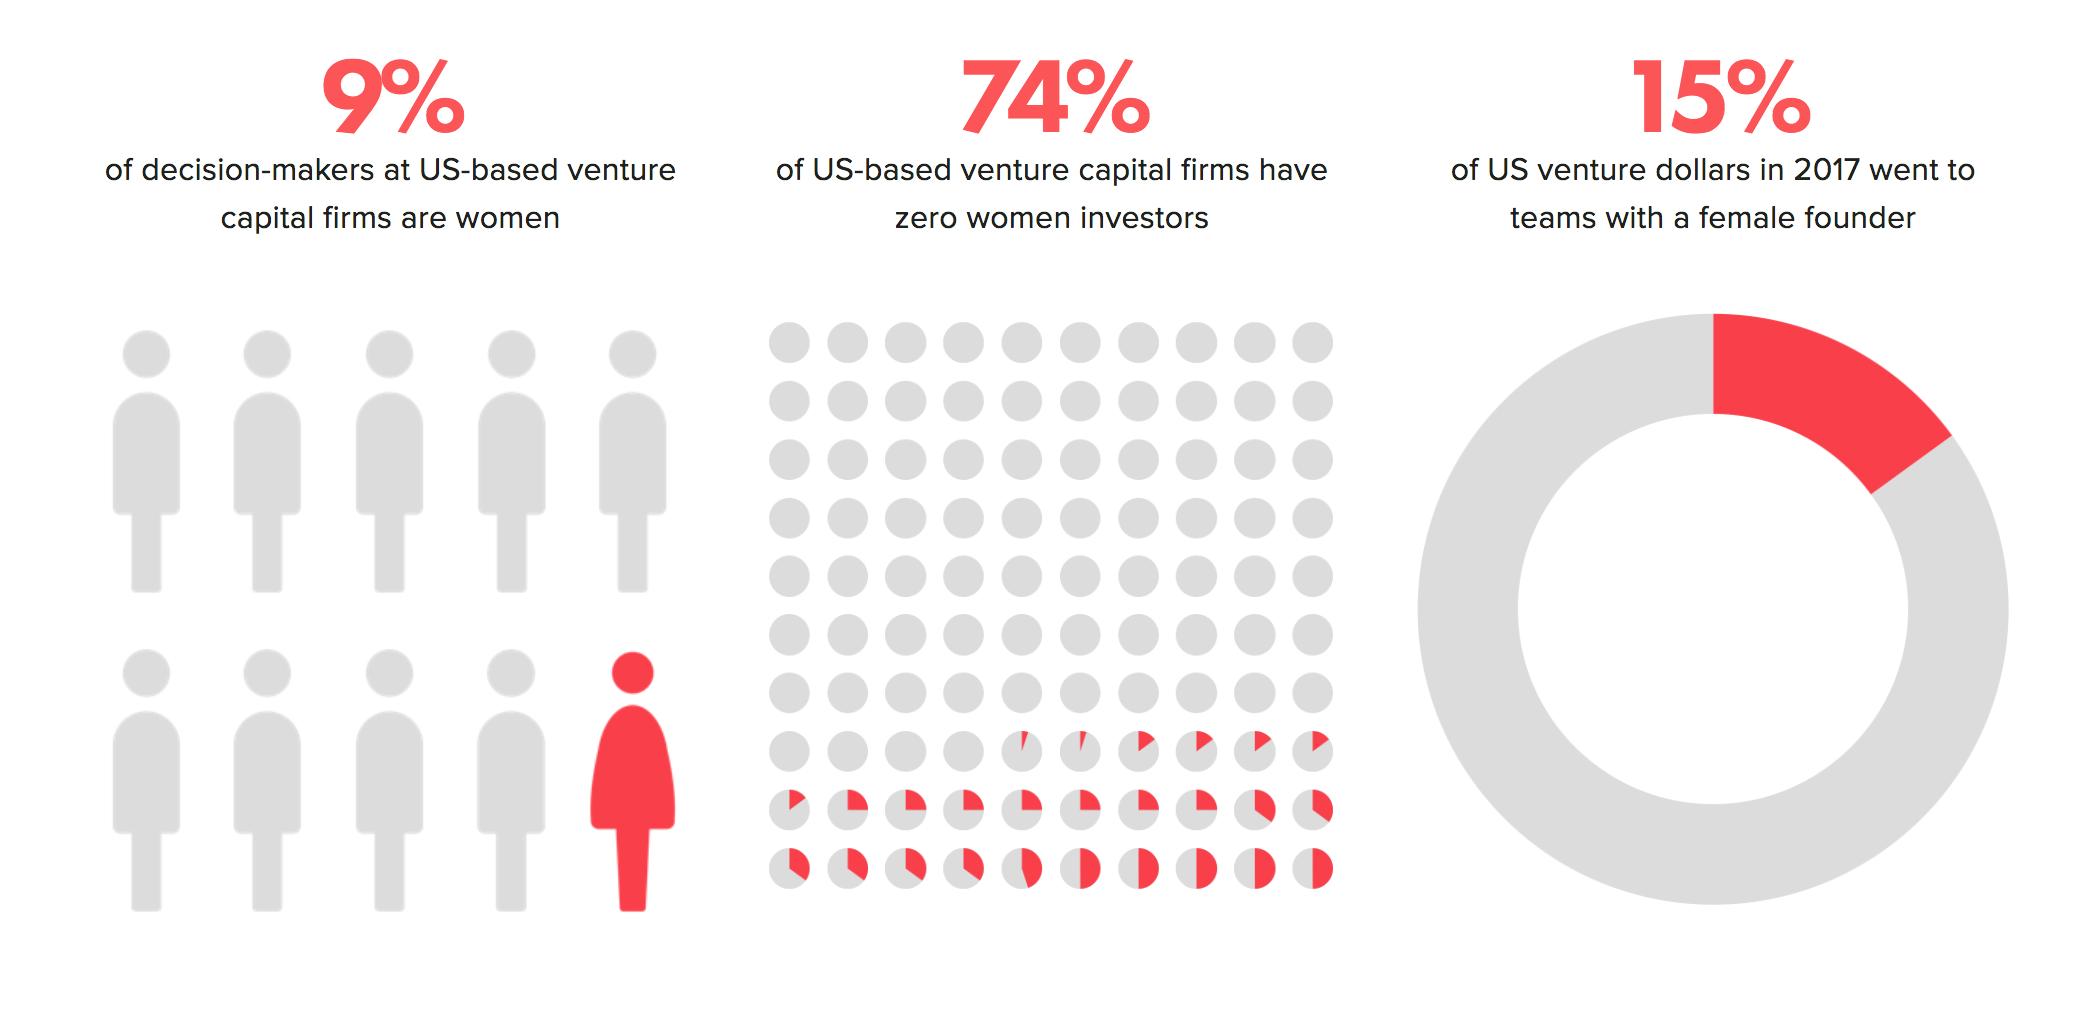 BBG Ventures partner: 'Men have been investing in men for the last 30 years'